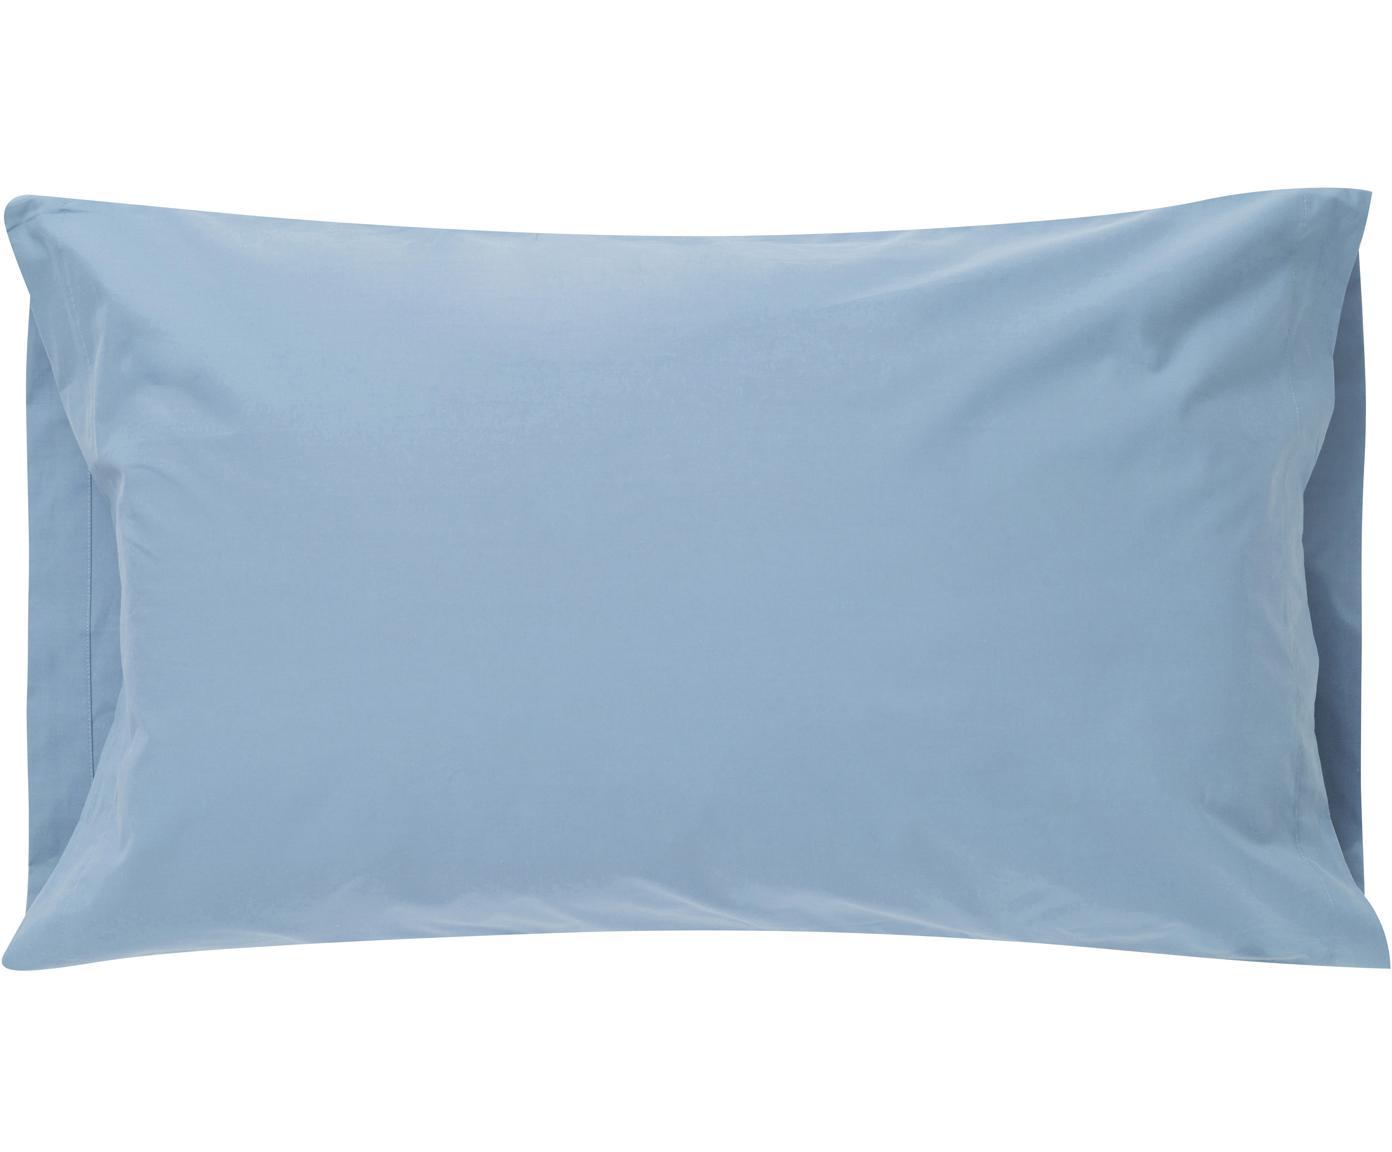 Fundas de almohada Plain Dye, 2uds., Algodón, Azul vaquero, An 50 x L 85 cm